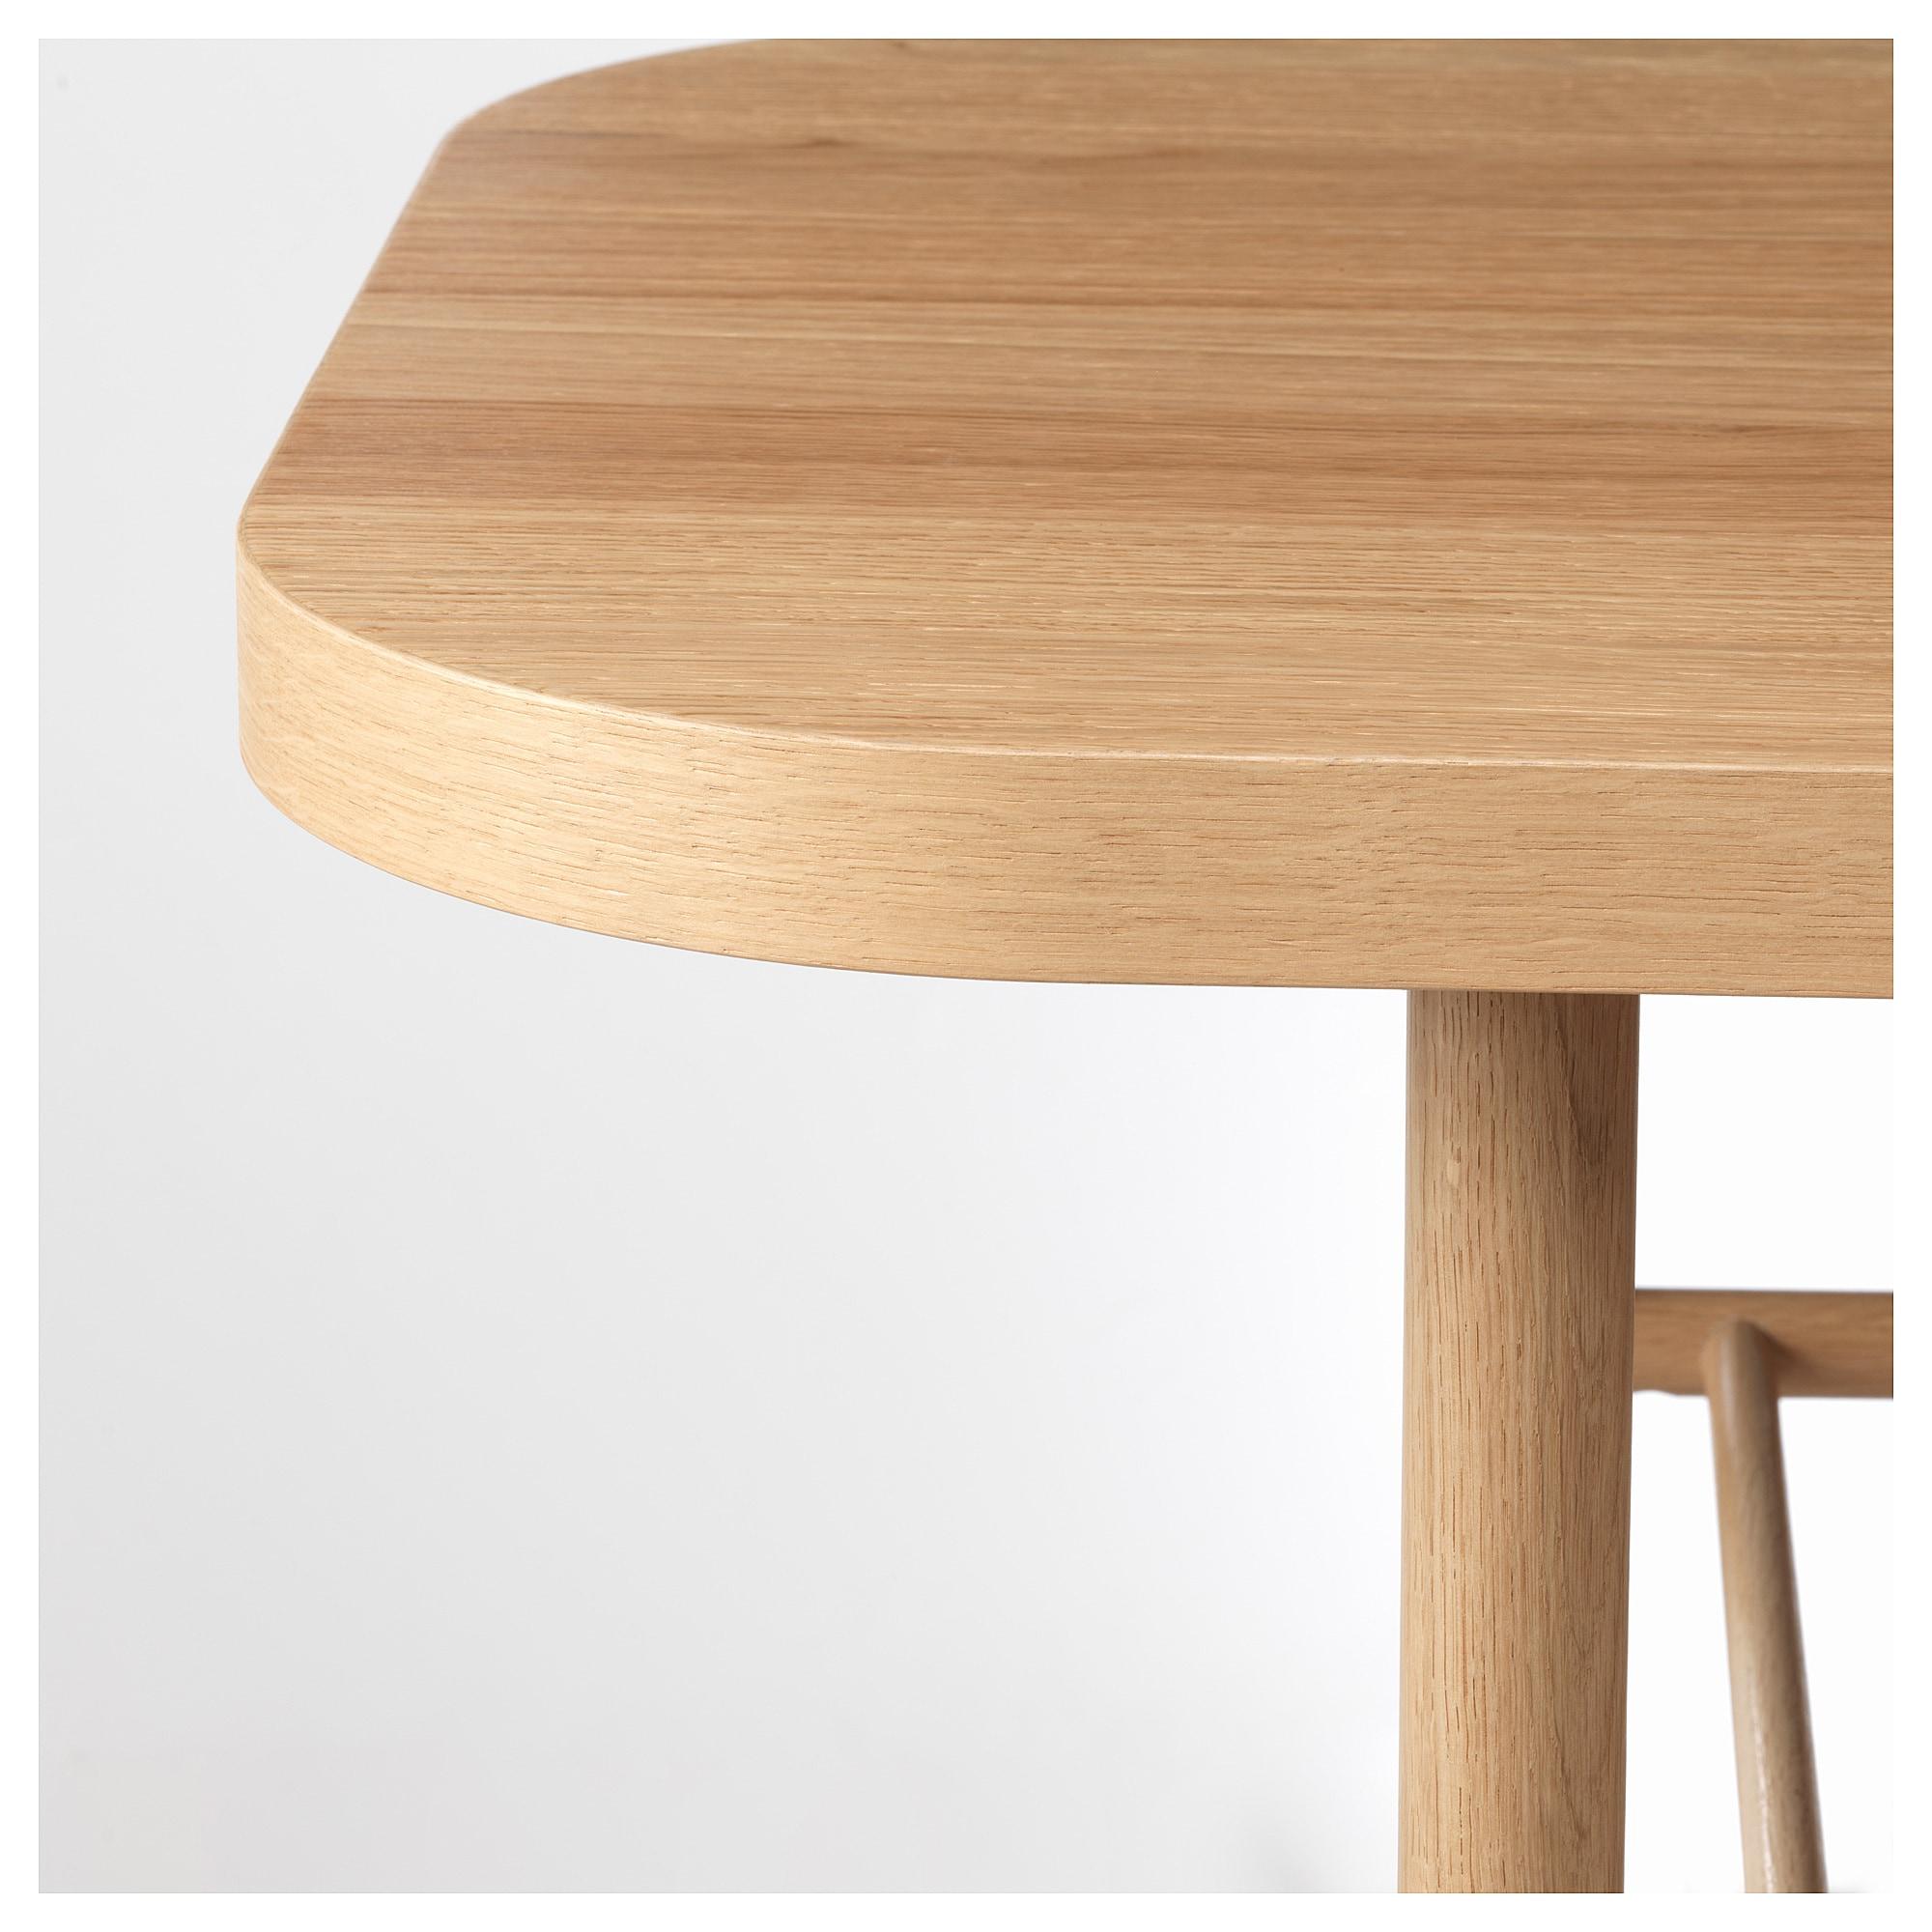 Marvelous Ikea Listerby White Stained Oak Coffee Table In 2019 Ikea Cjindustries Chair Design For Home Cjindustriesco